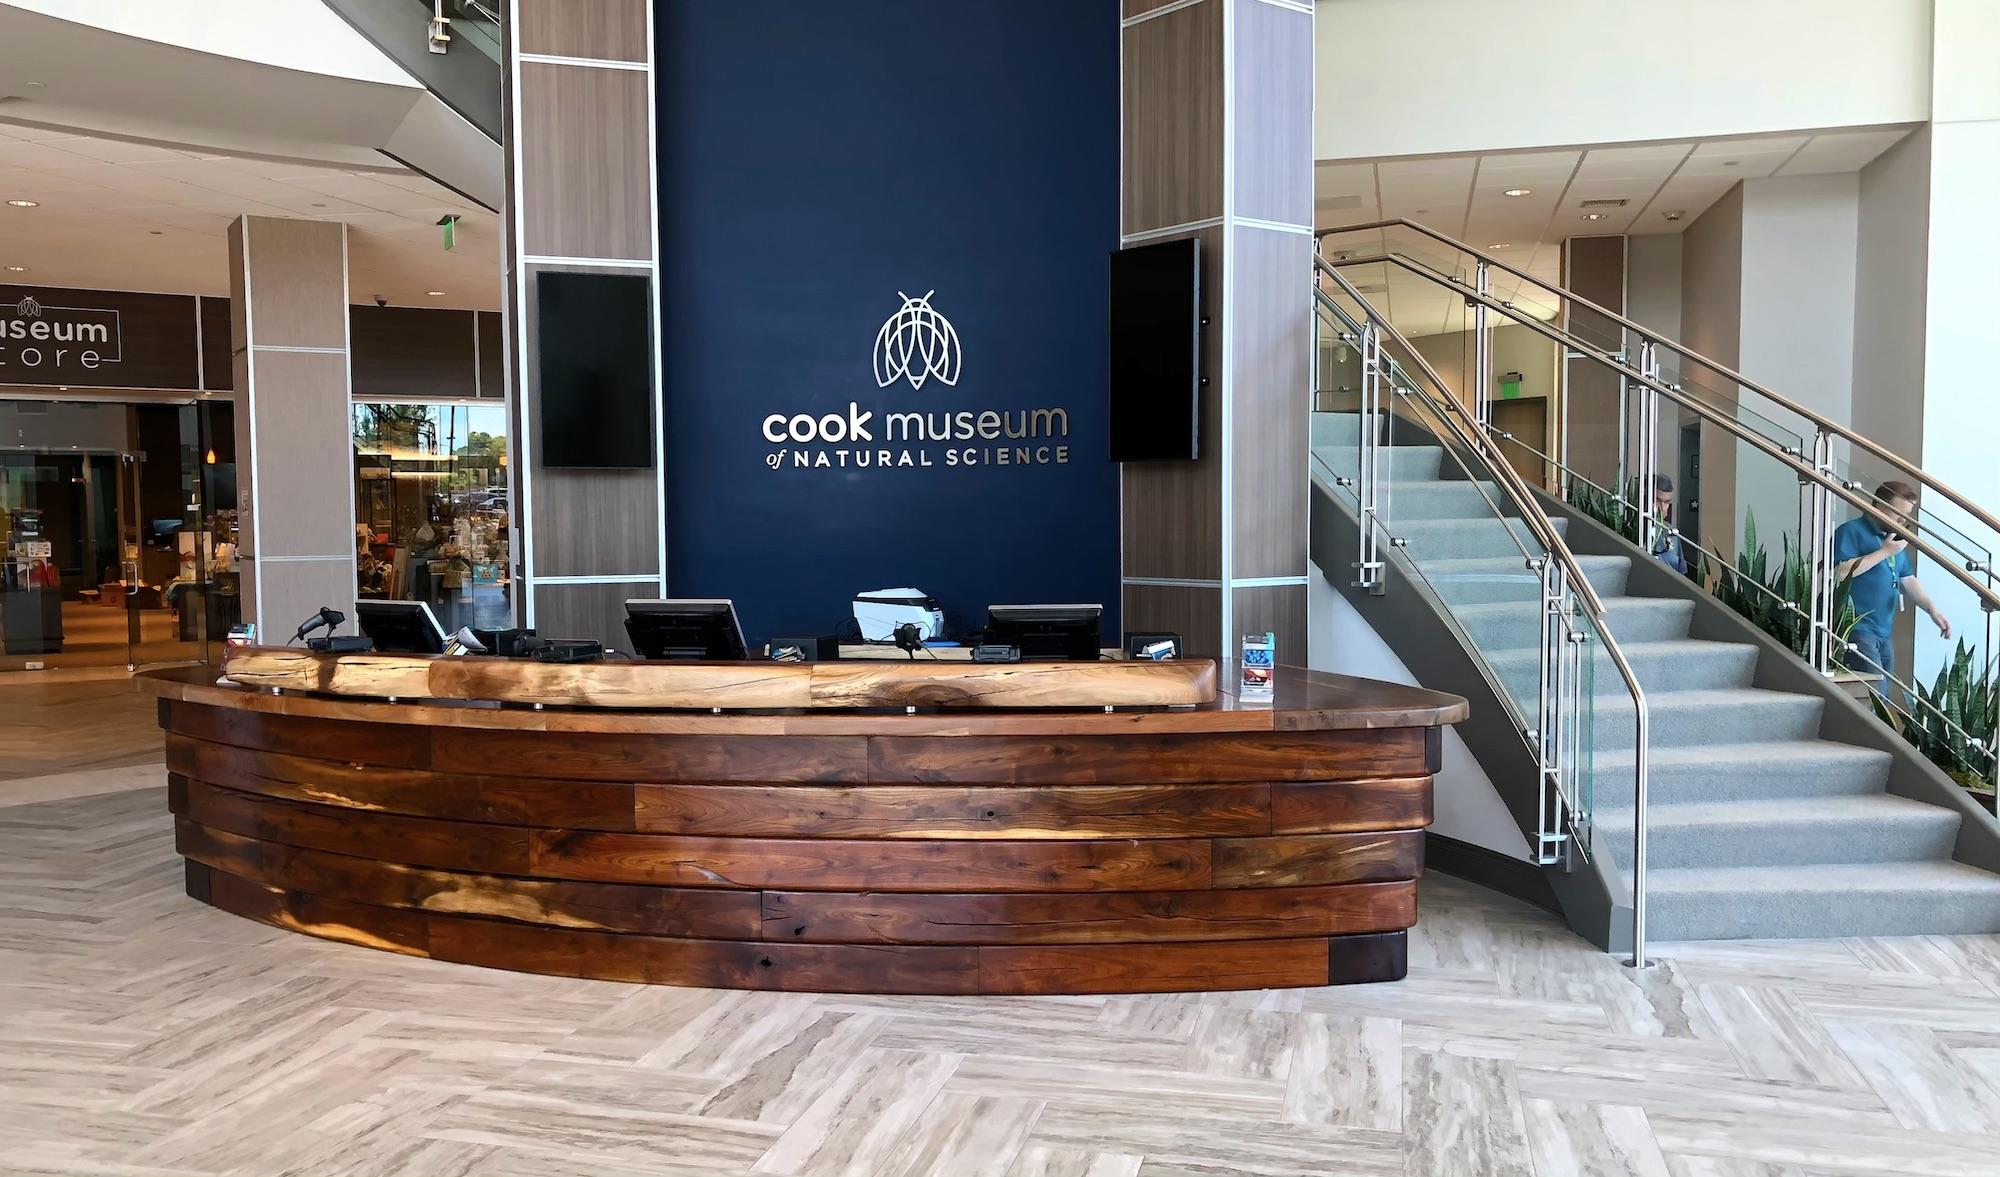 CookMuseum4snapf2k.jpg